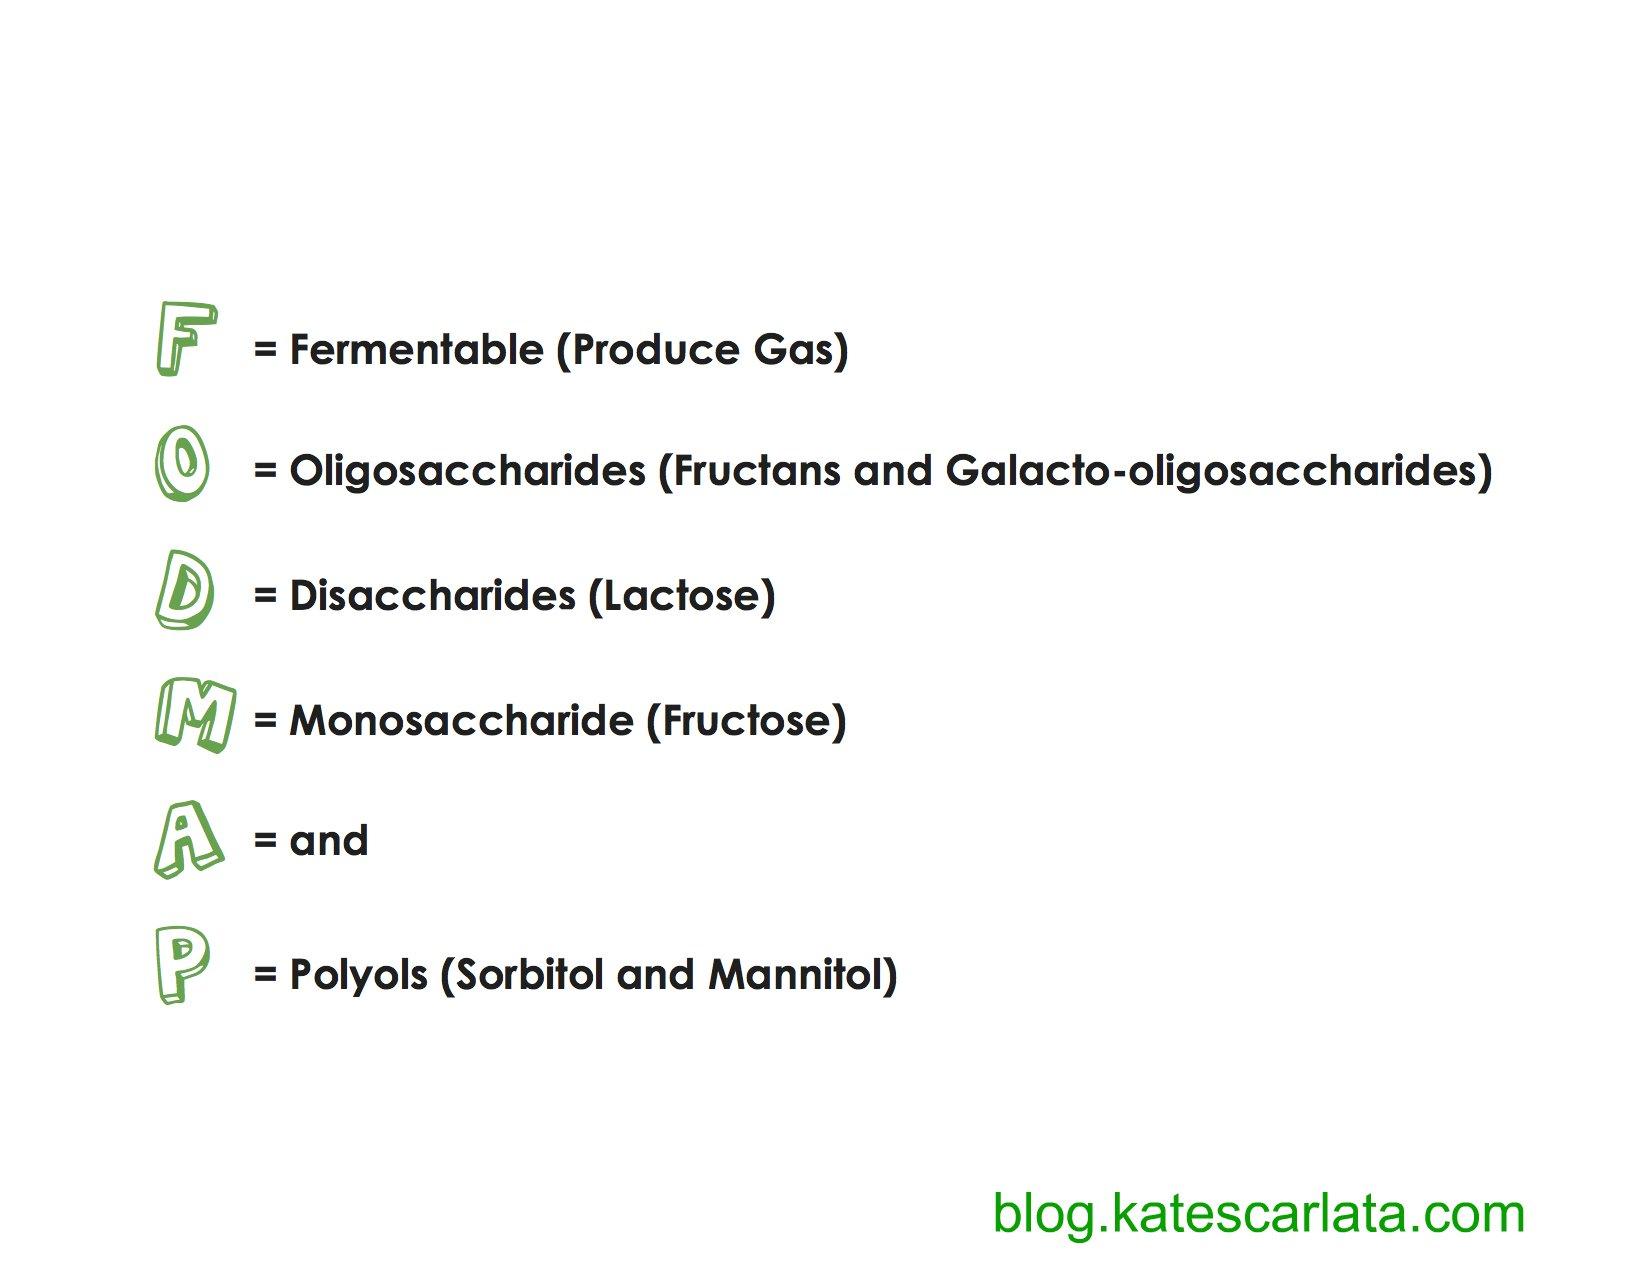 Celiac.com Celiac Disease & Gluten-free Diet Forum | Our ...